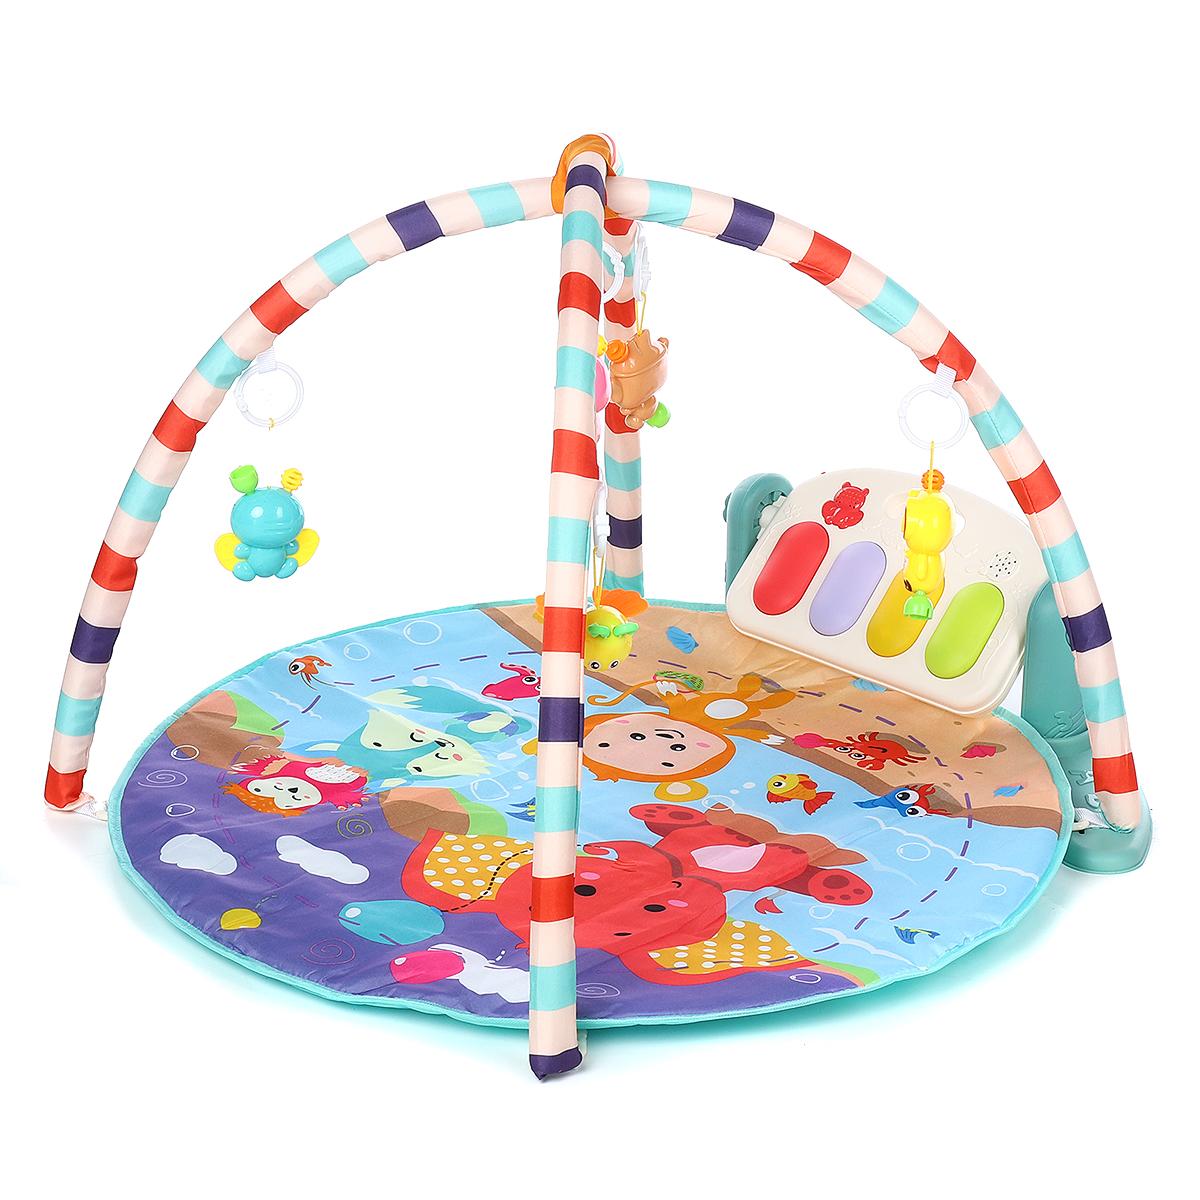 4-in-1 Newborn Infant Baby Musical Piano Play Mat Blanket Kids Activity Carpet Crawling Mat Kids Mat